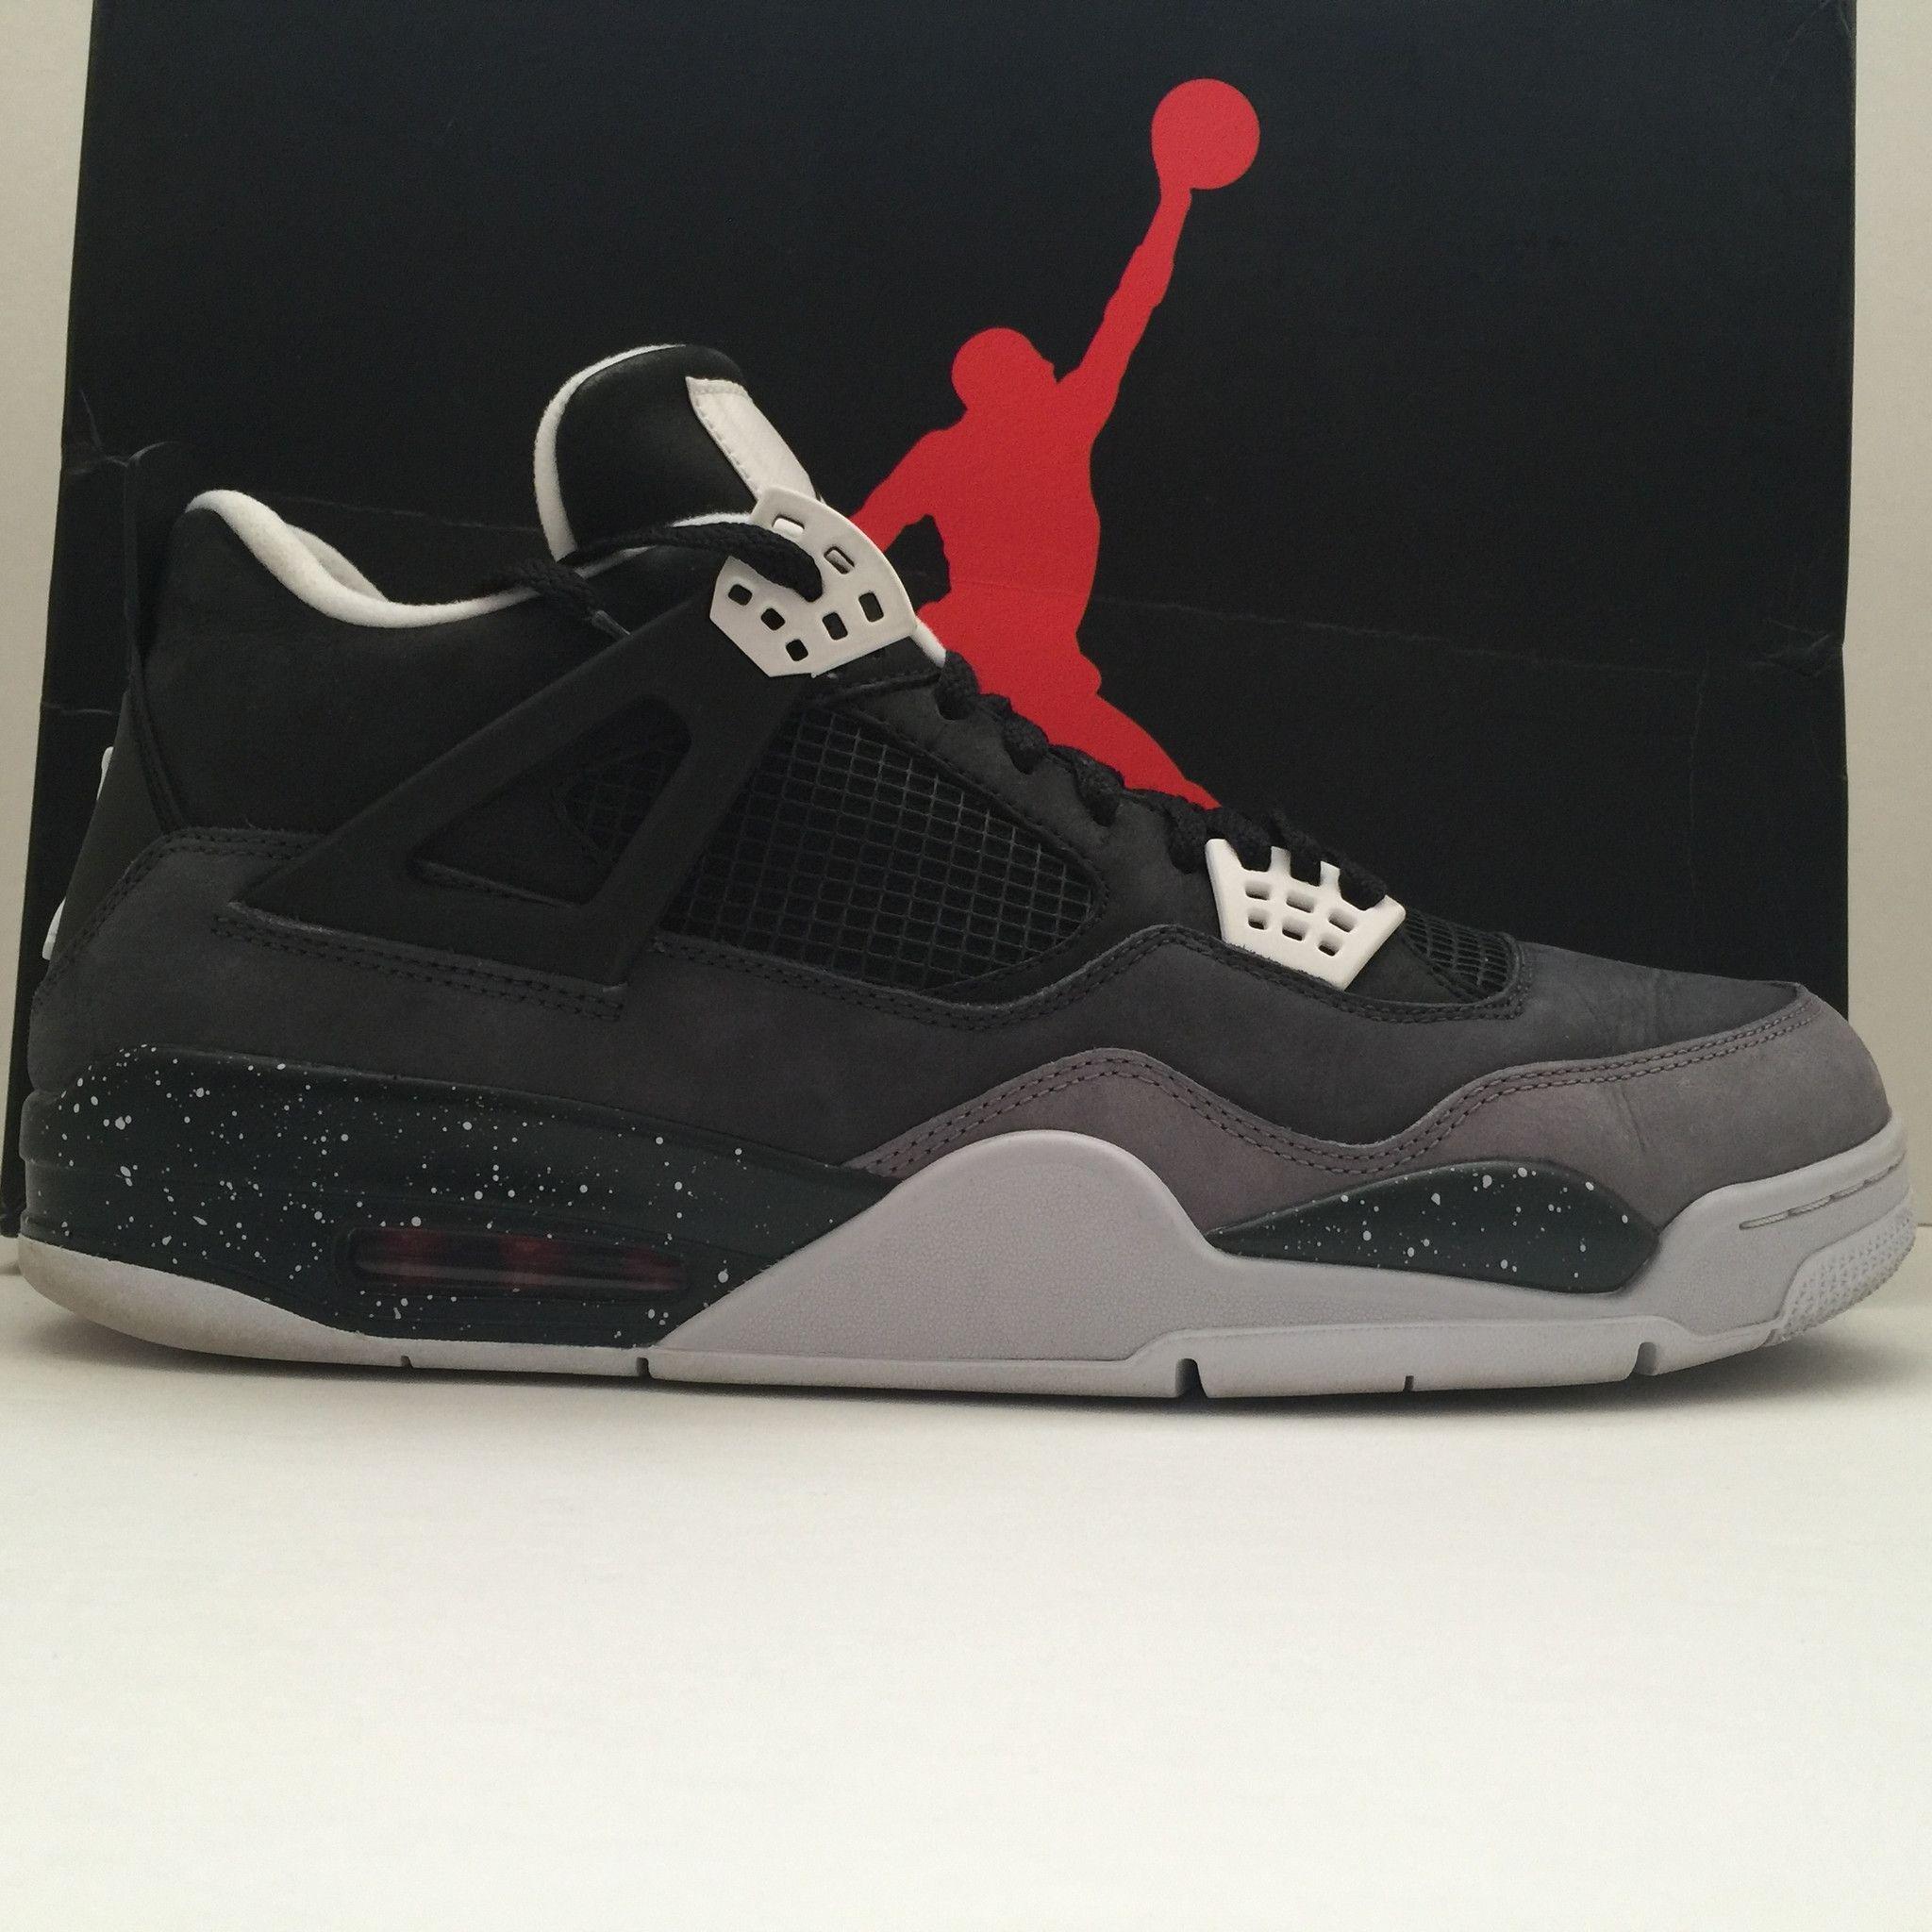 buy popular d456f 5b0dc Nike Air Jordan 4 IV Retro Fear Size 13